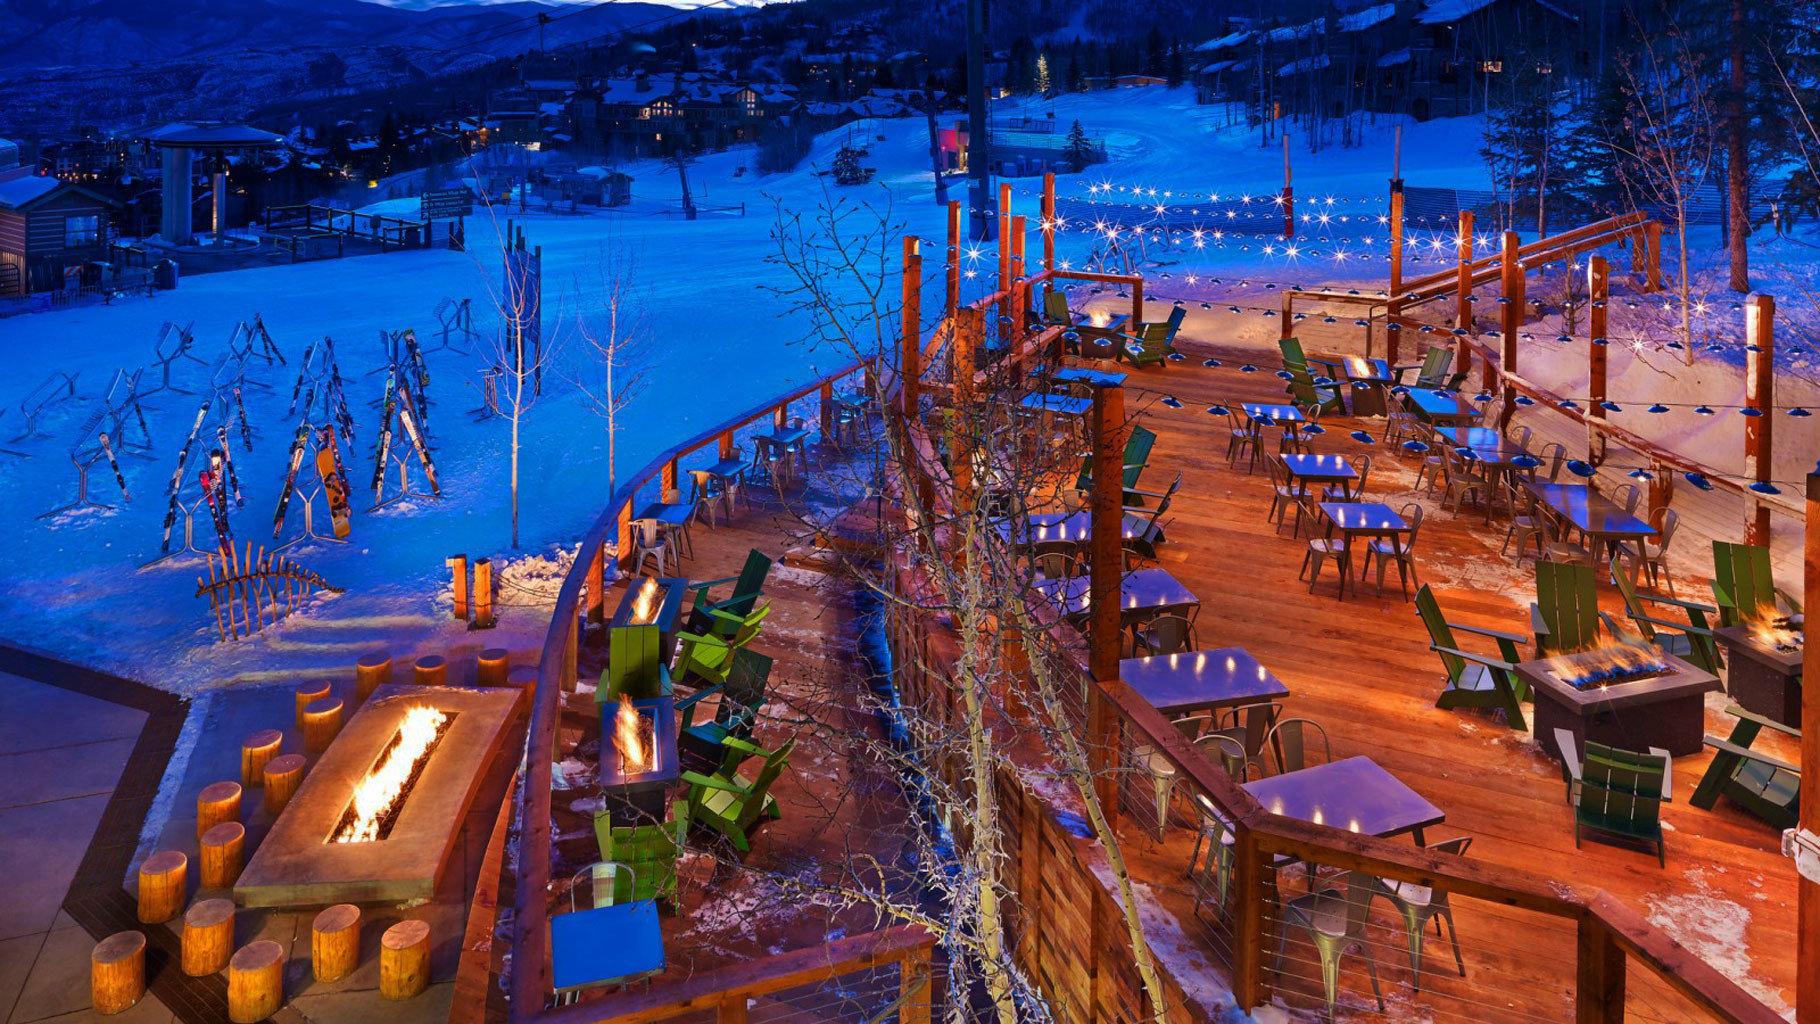 scene night Town Resort evening Winter Harbor cityscape amusement park dock